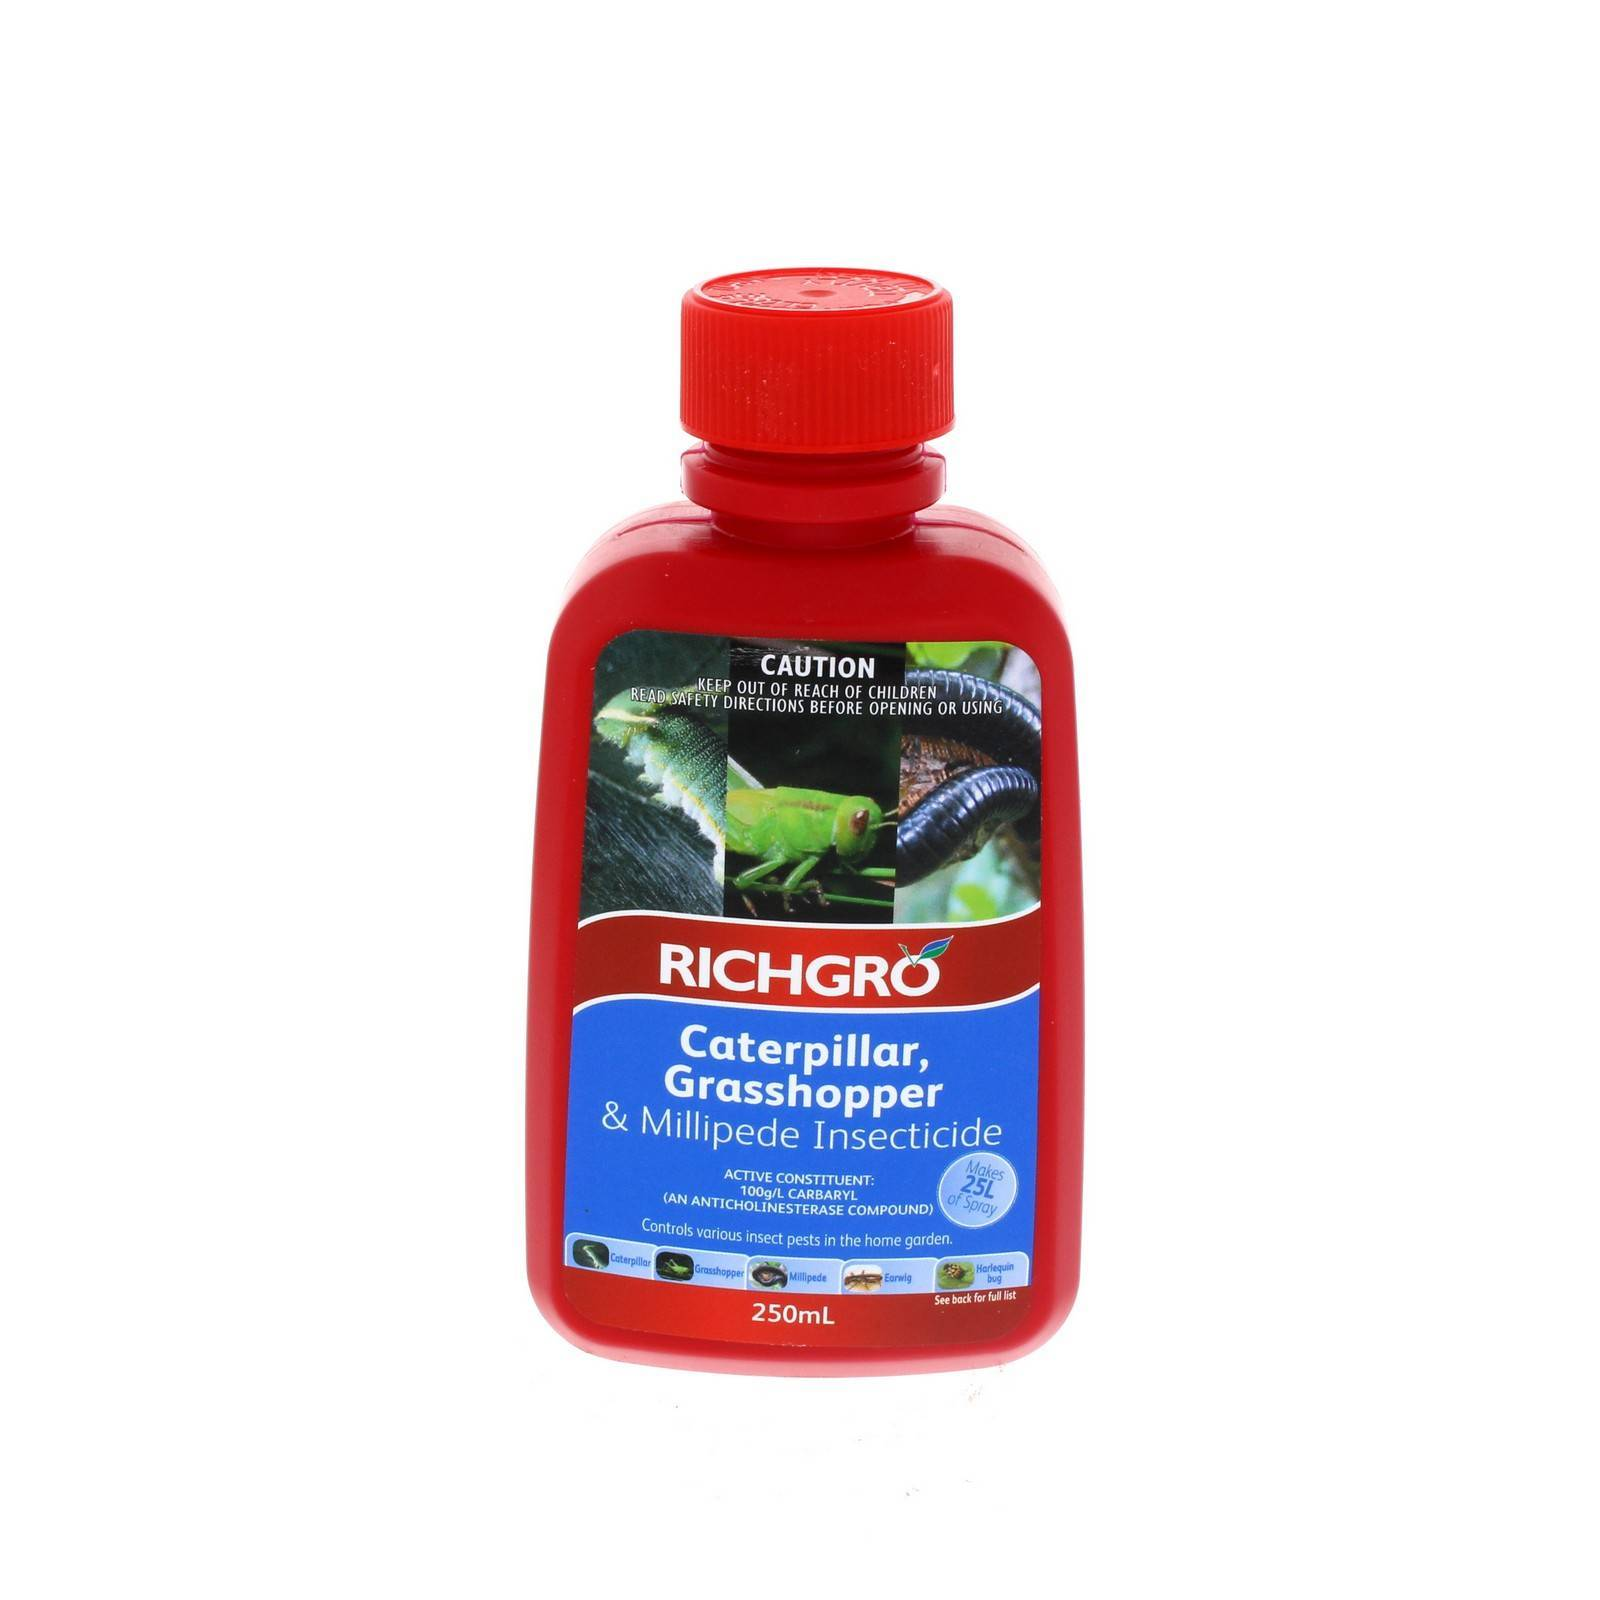 Caterpillar Grasshopper Millipede Insecticide 250ml 100g/L Carbaryl Richgro